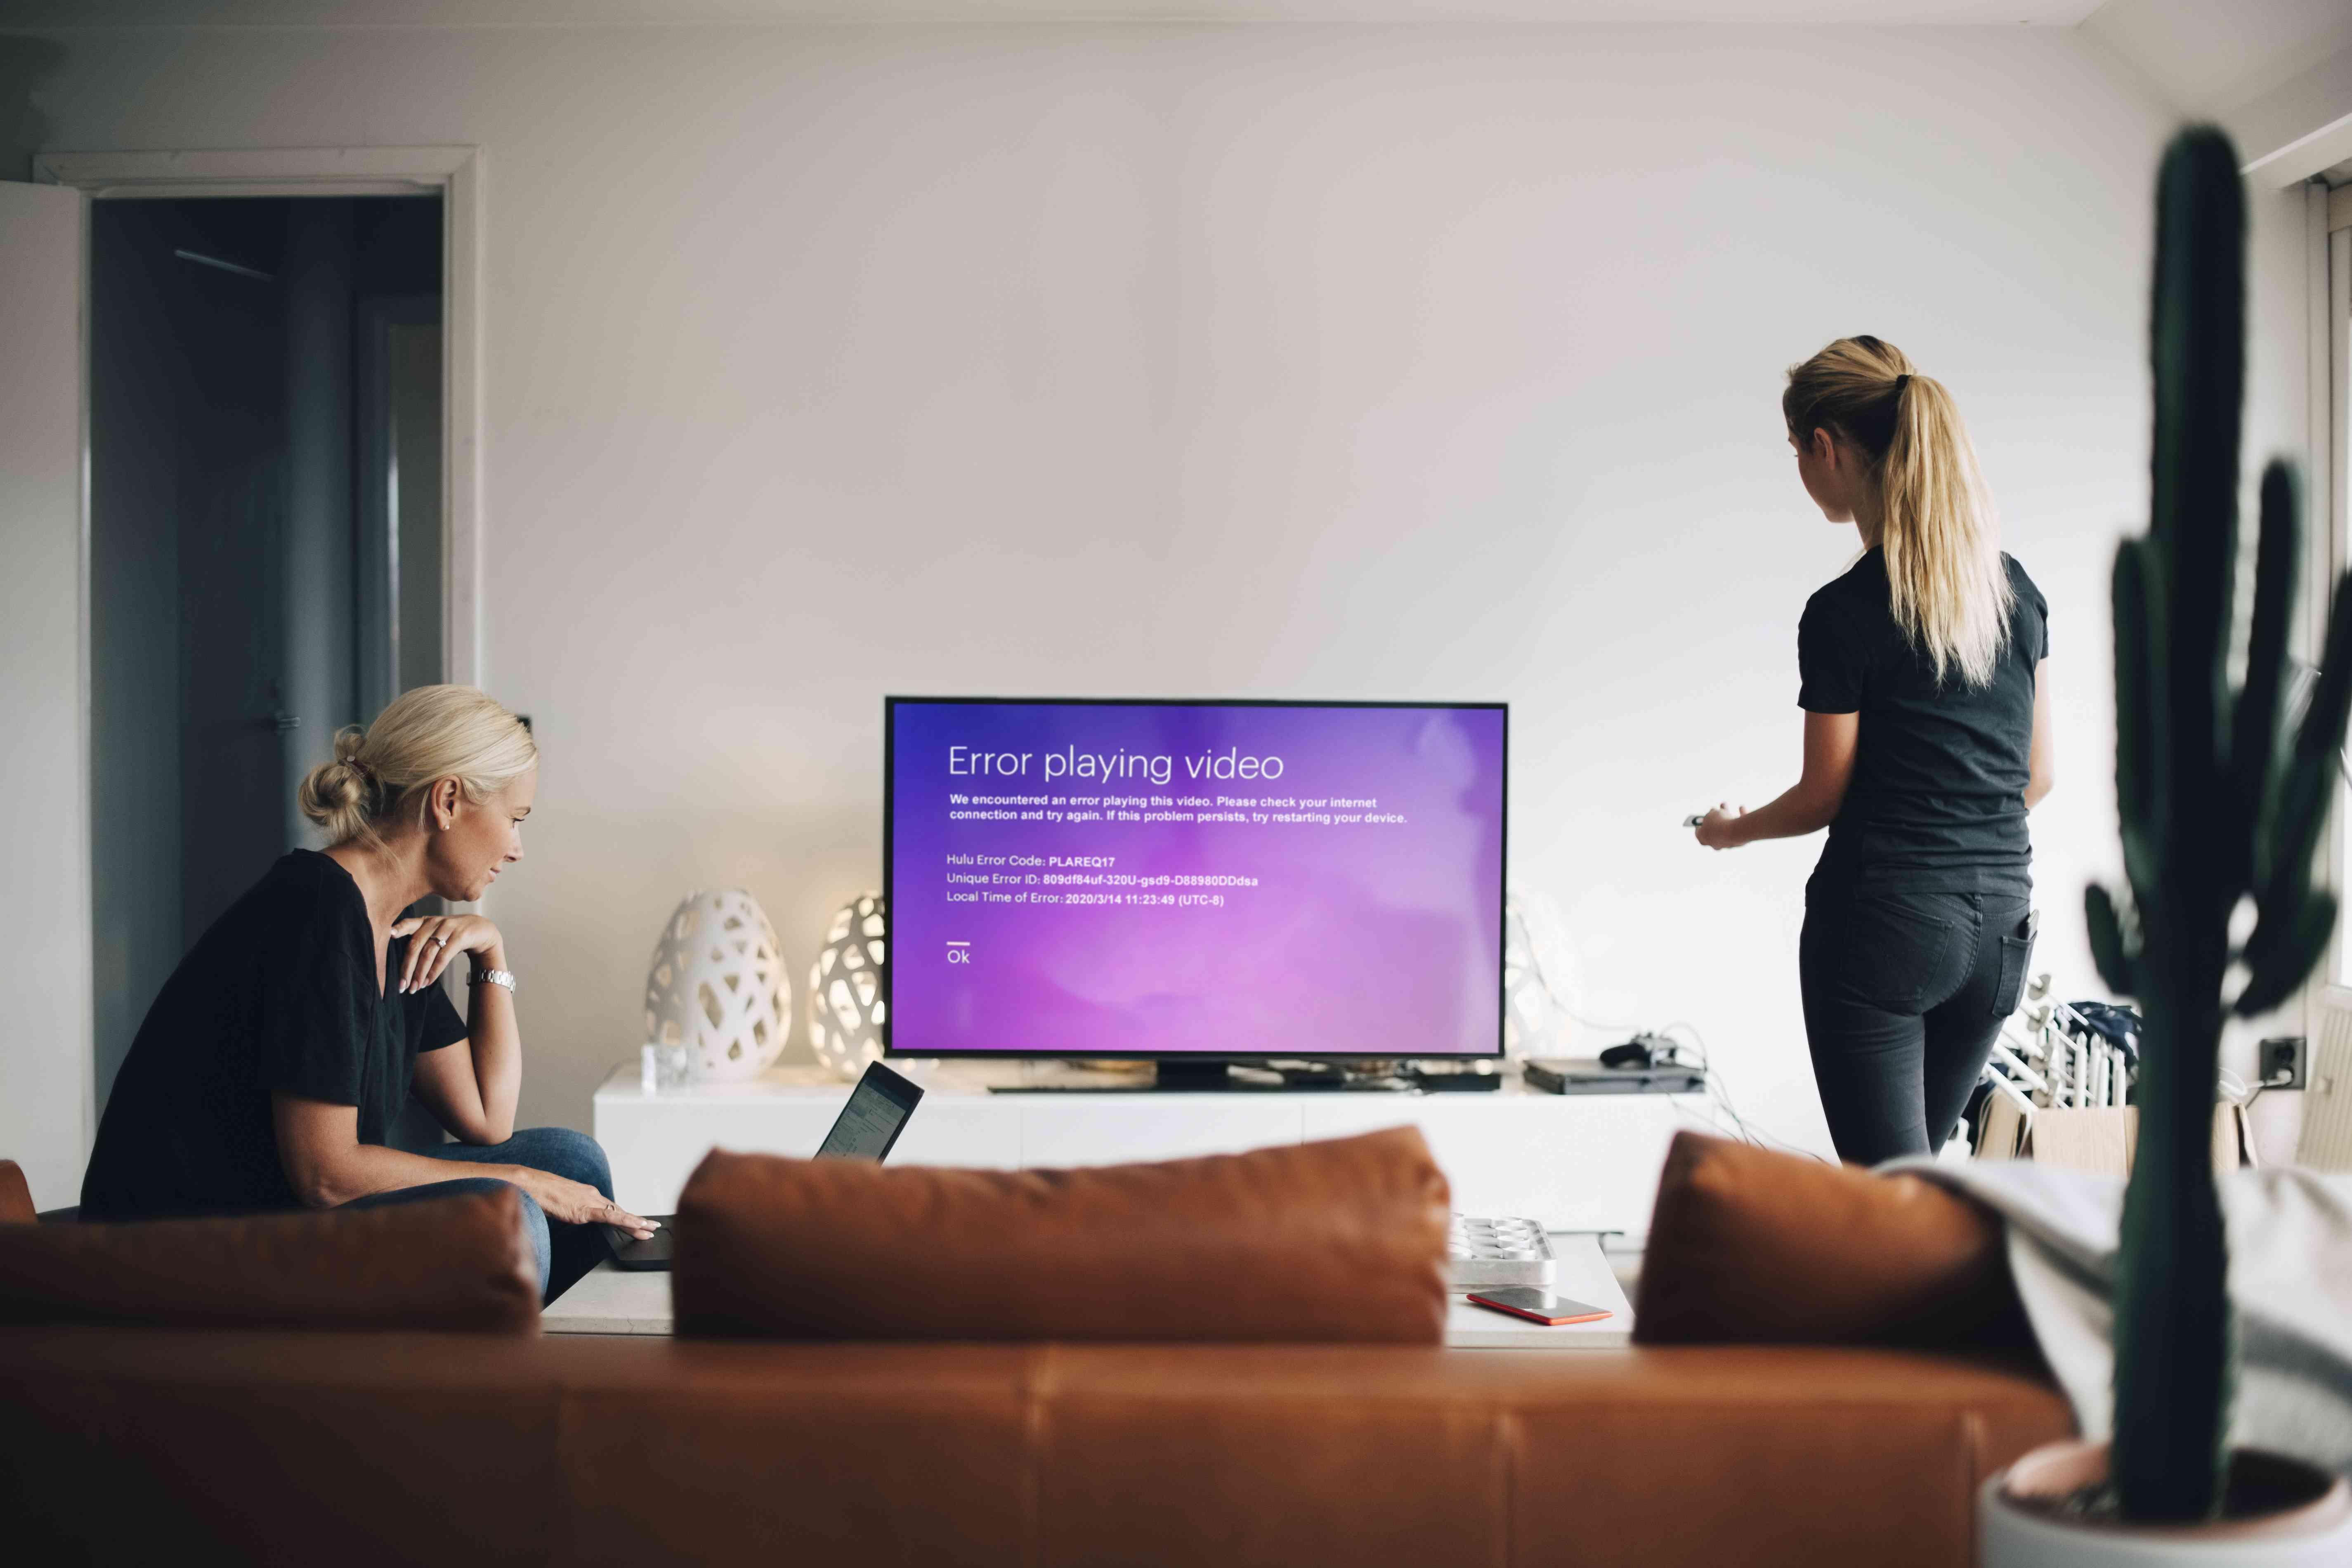 Hulu error code PLAREQ17 displayed on a television.